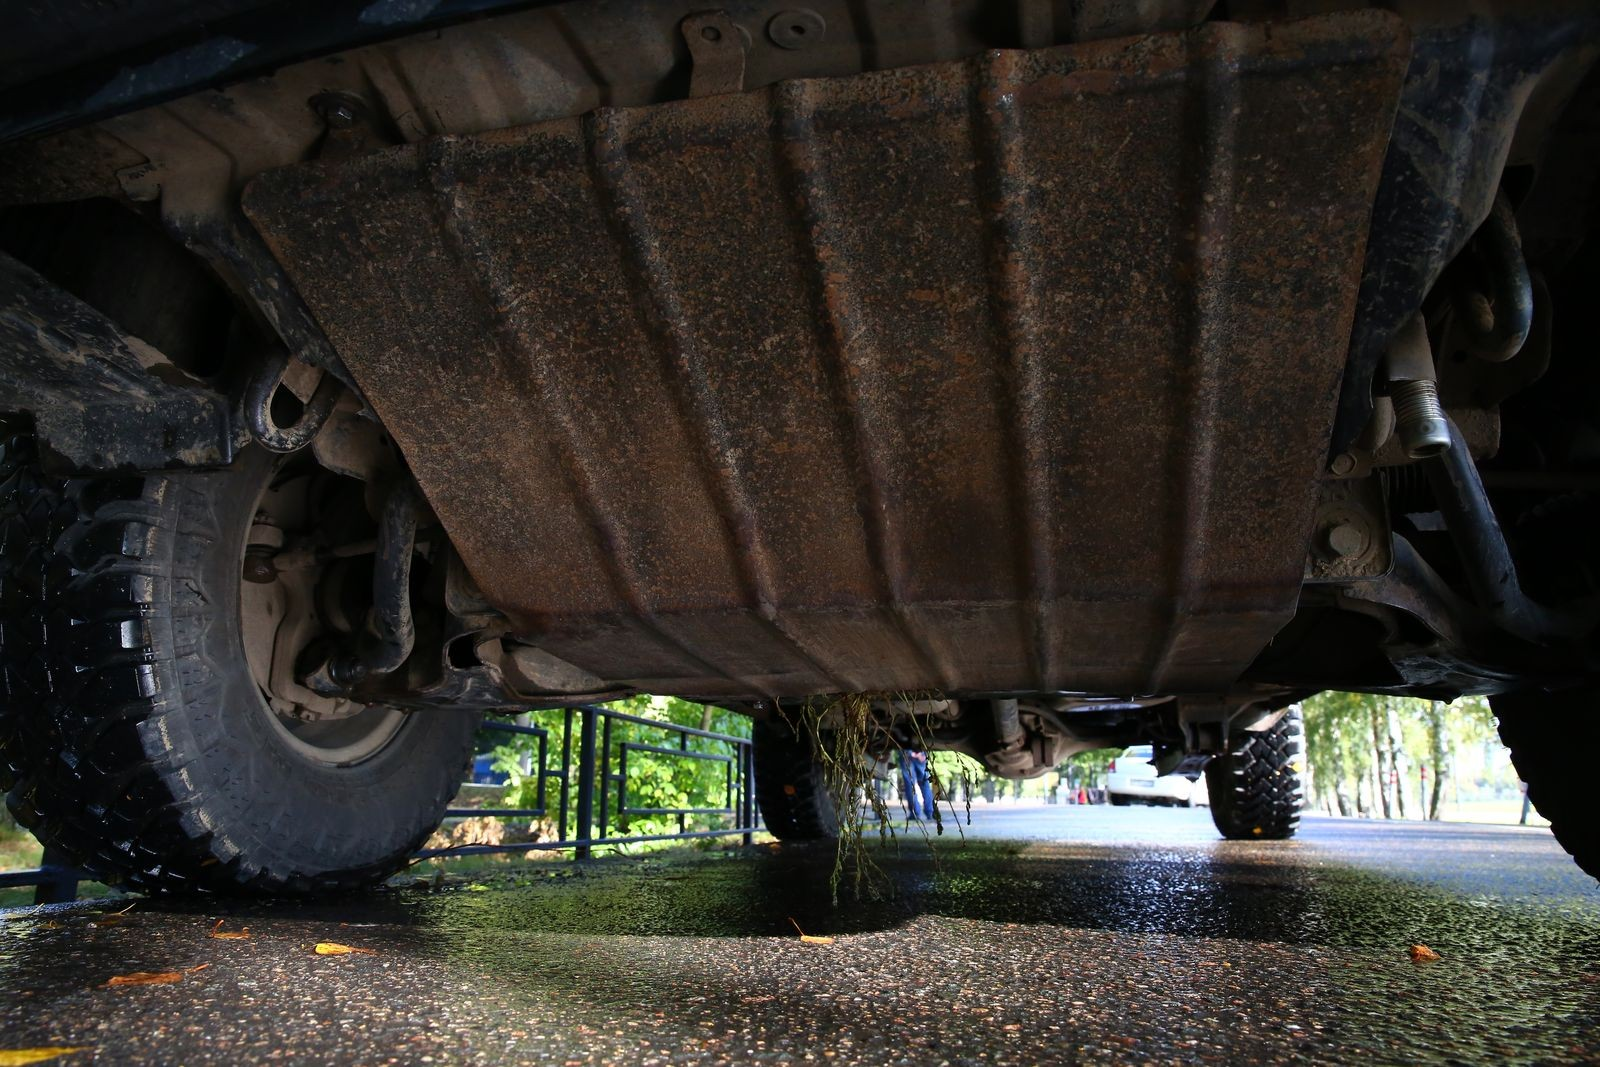 Hyundai Starex/H-1 A1 с пробегом: кузов жив, пока не сгнила рама, а электрика чинится на коленке